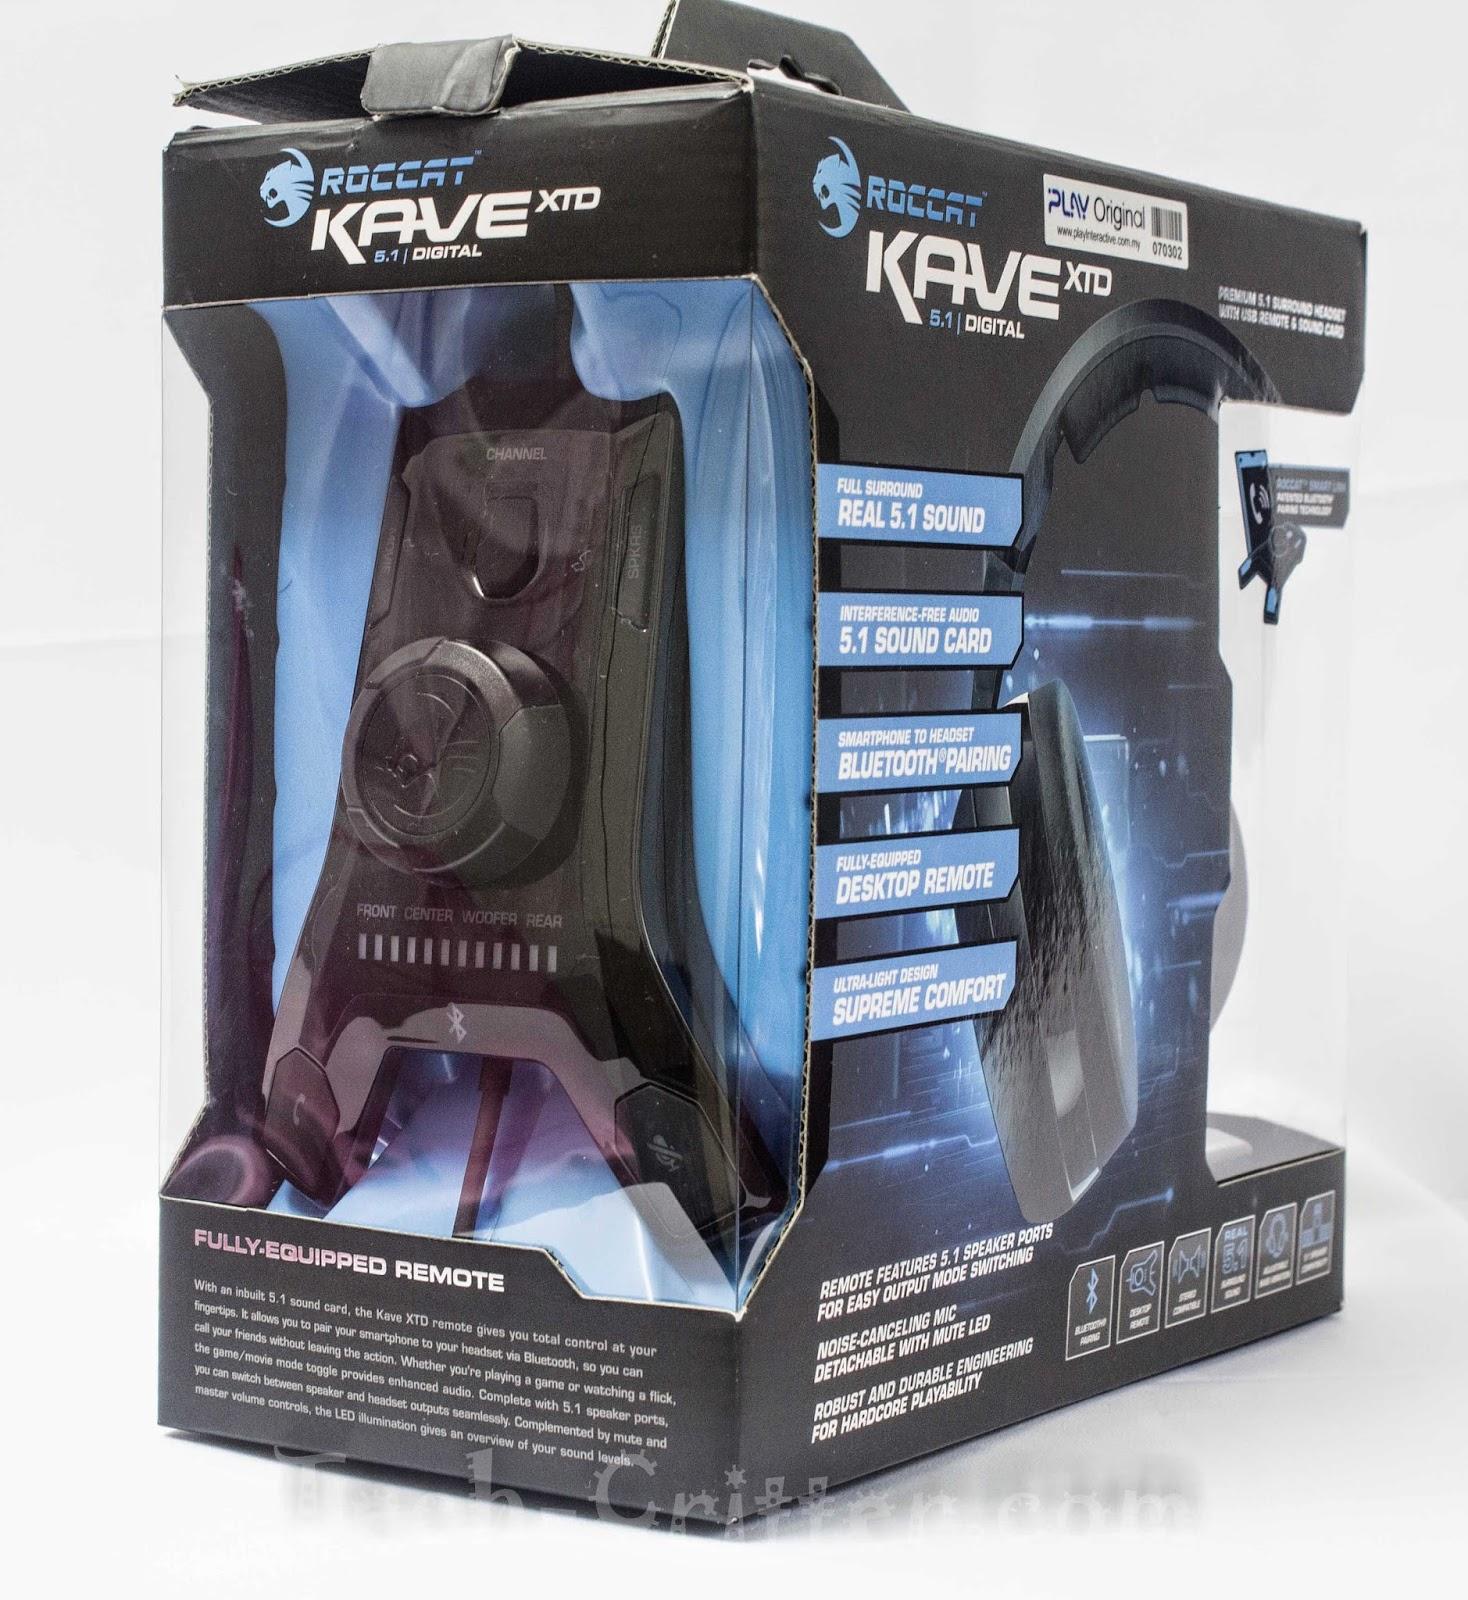 Unboxing & Review: Roccat Kave XTD 5.1 Digital Surround Sound Headset 56